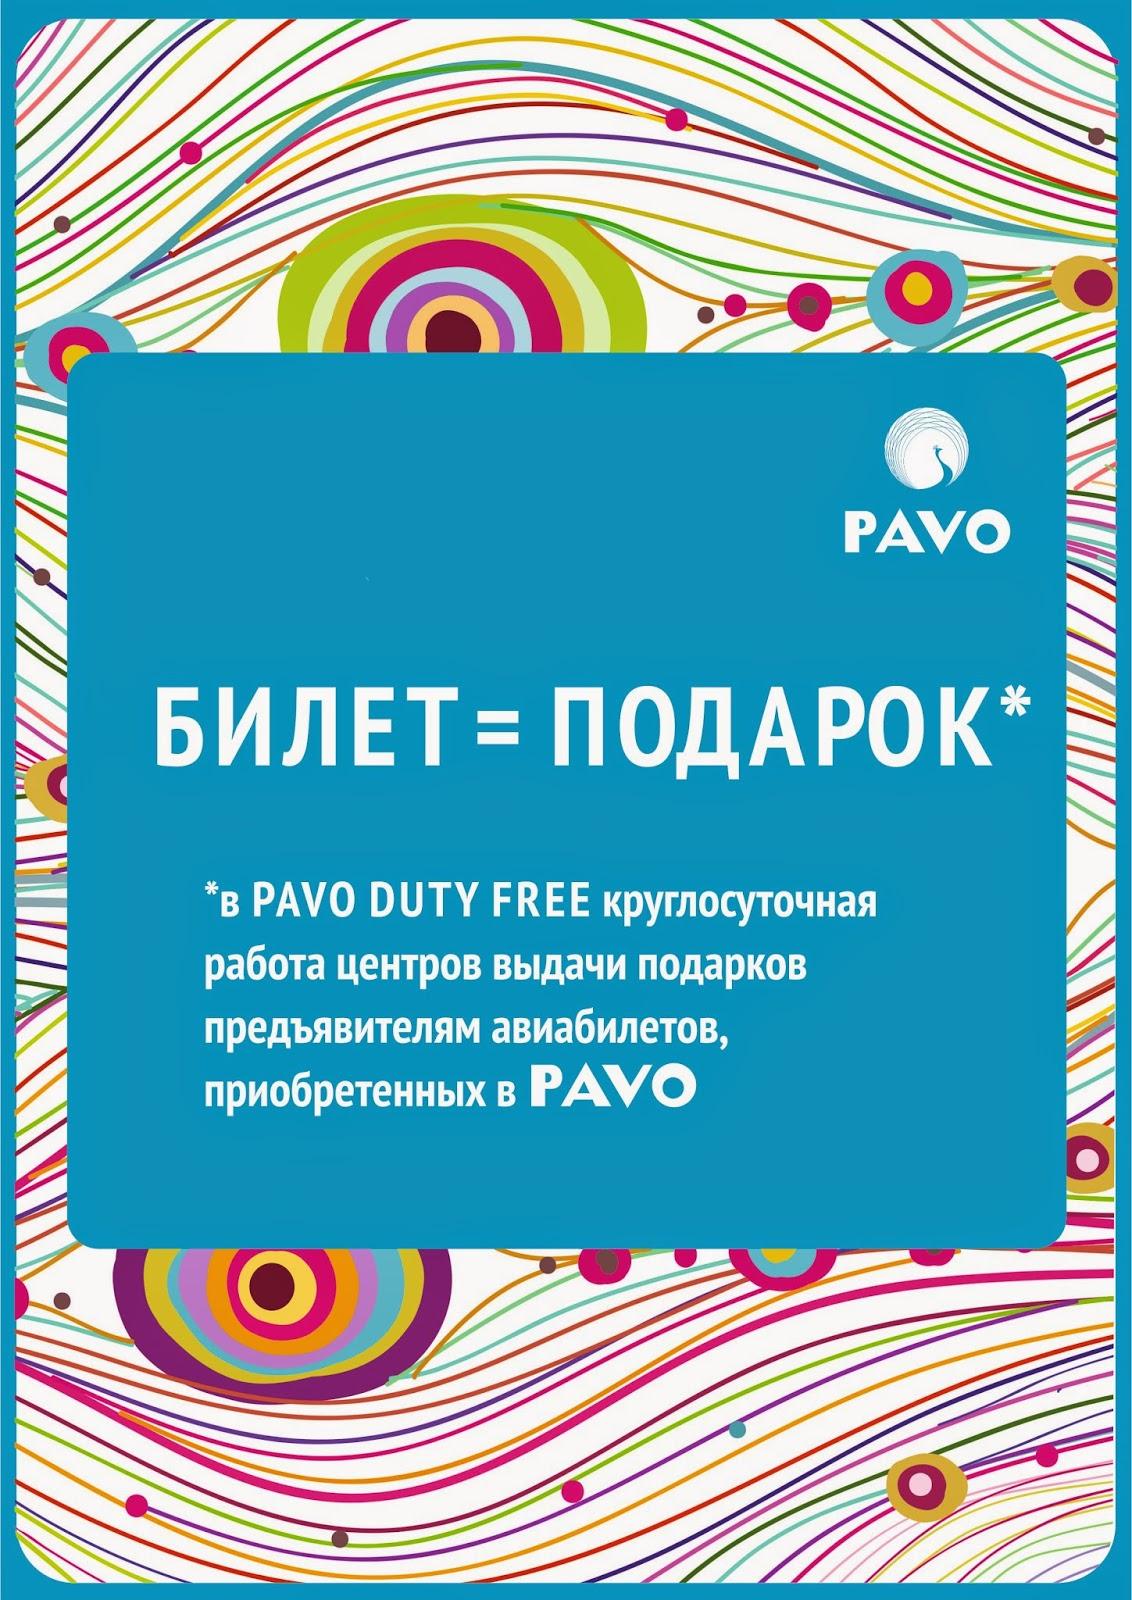 http://anp-s2.symphony.cz/ru/index.php